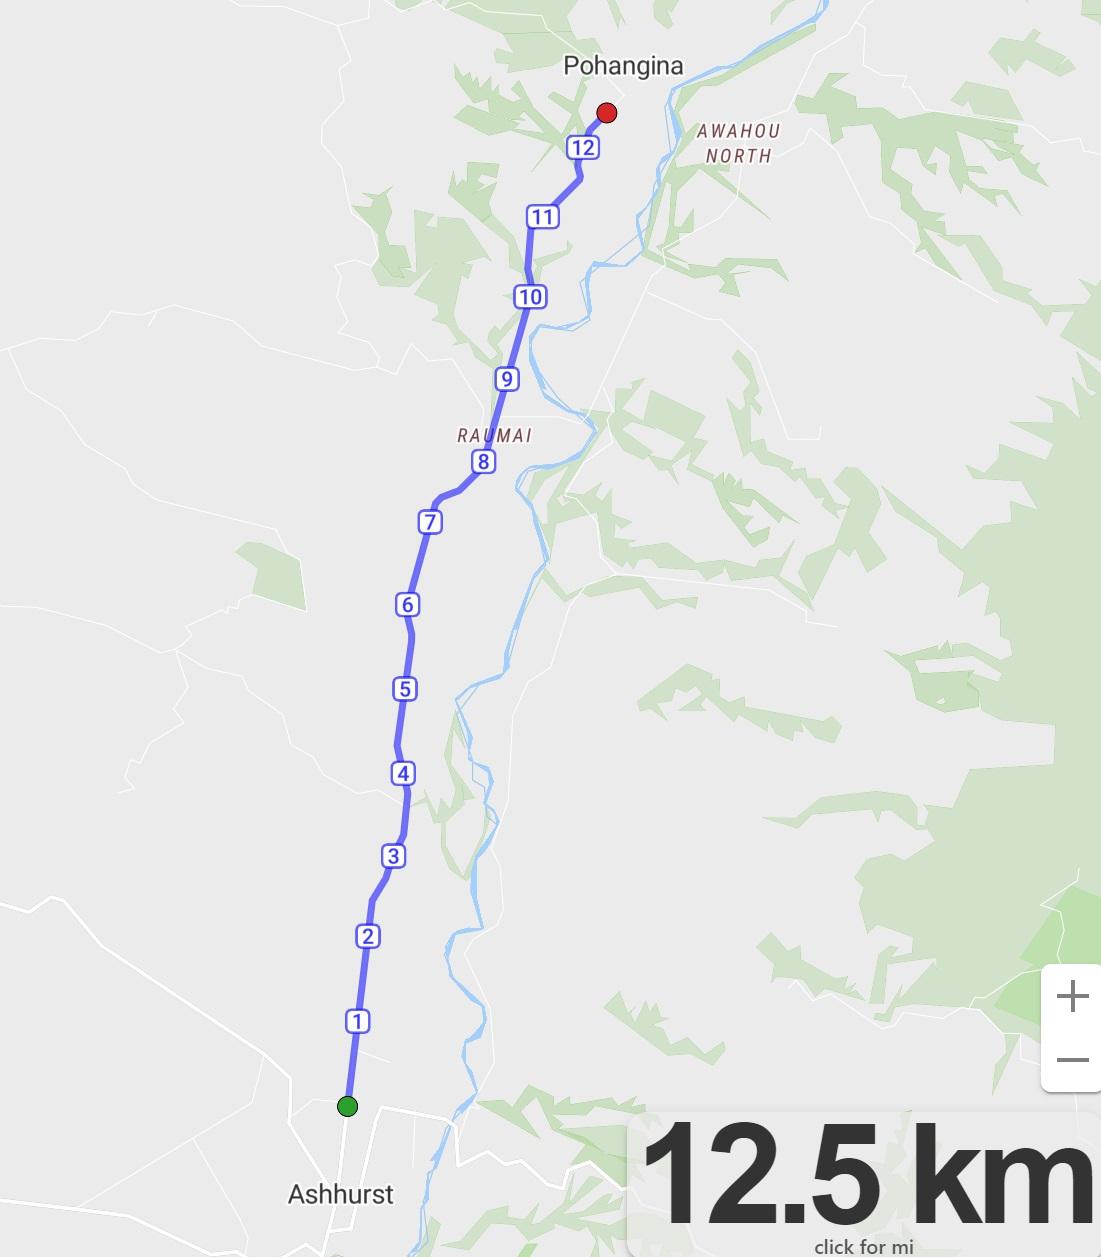 Stage 2 Ashhurst to Pohangina map